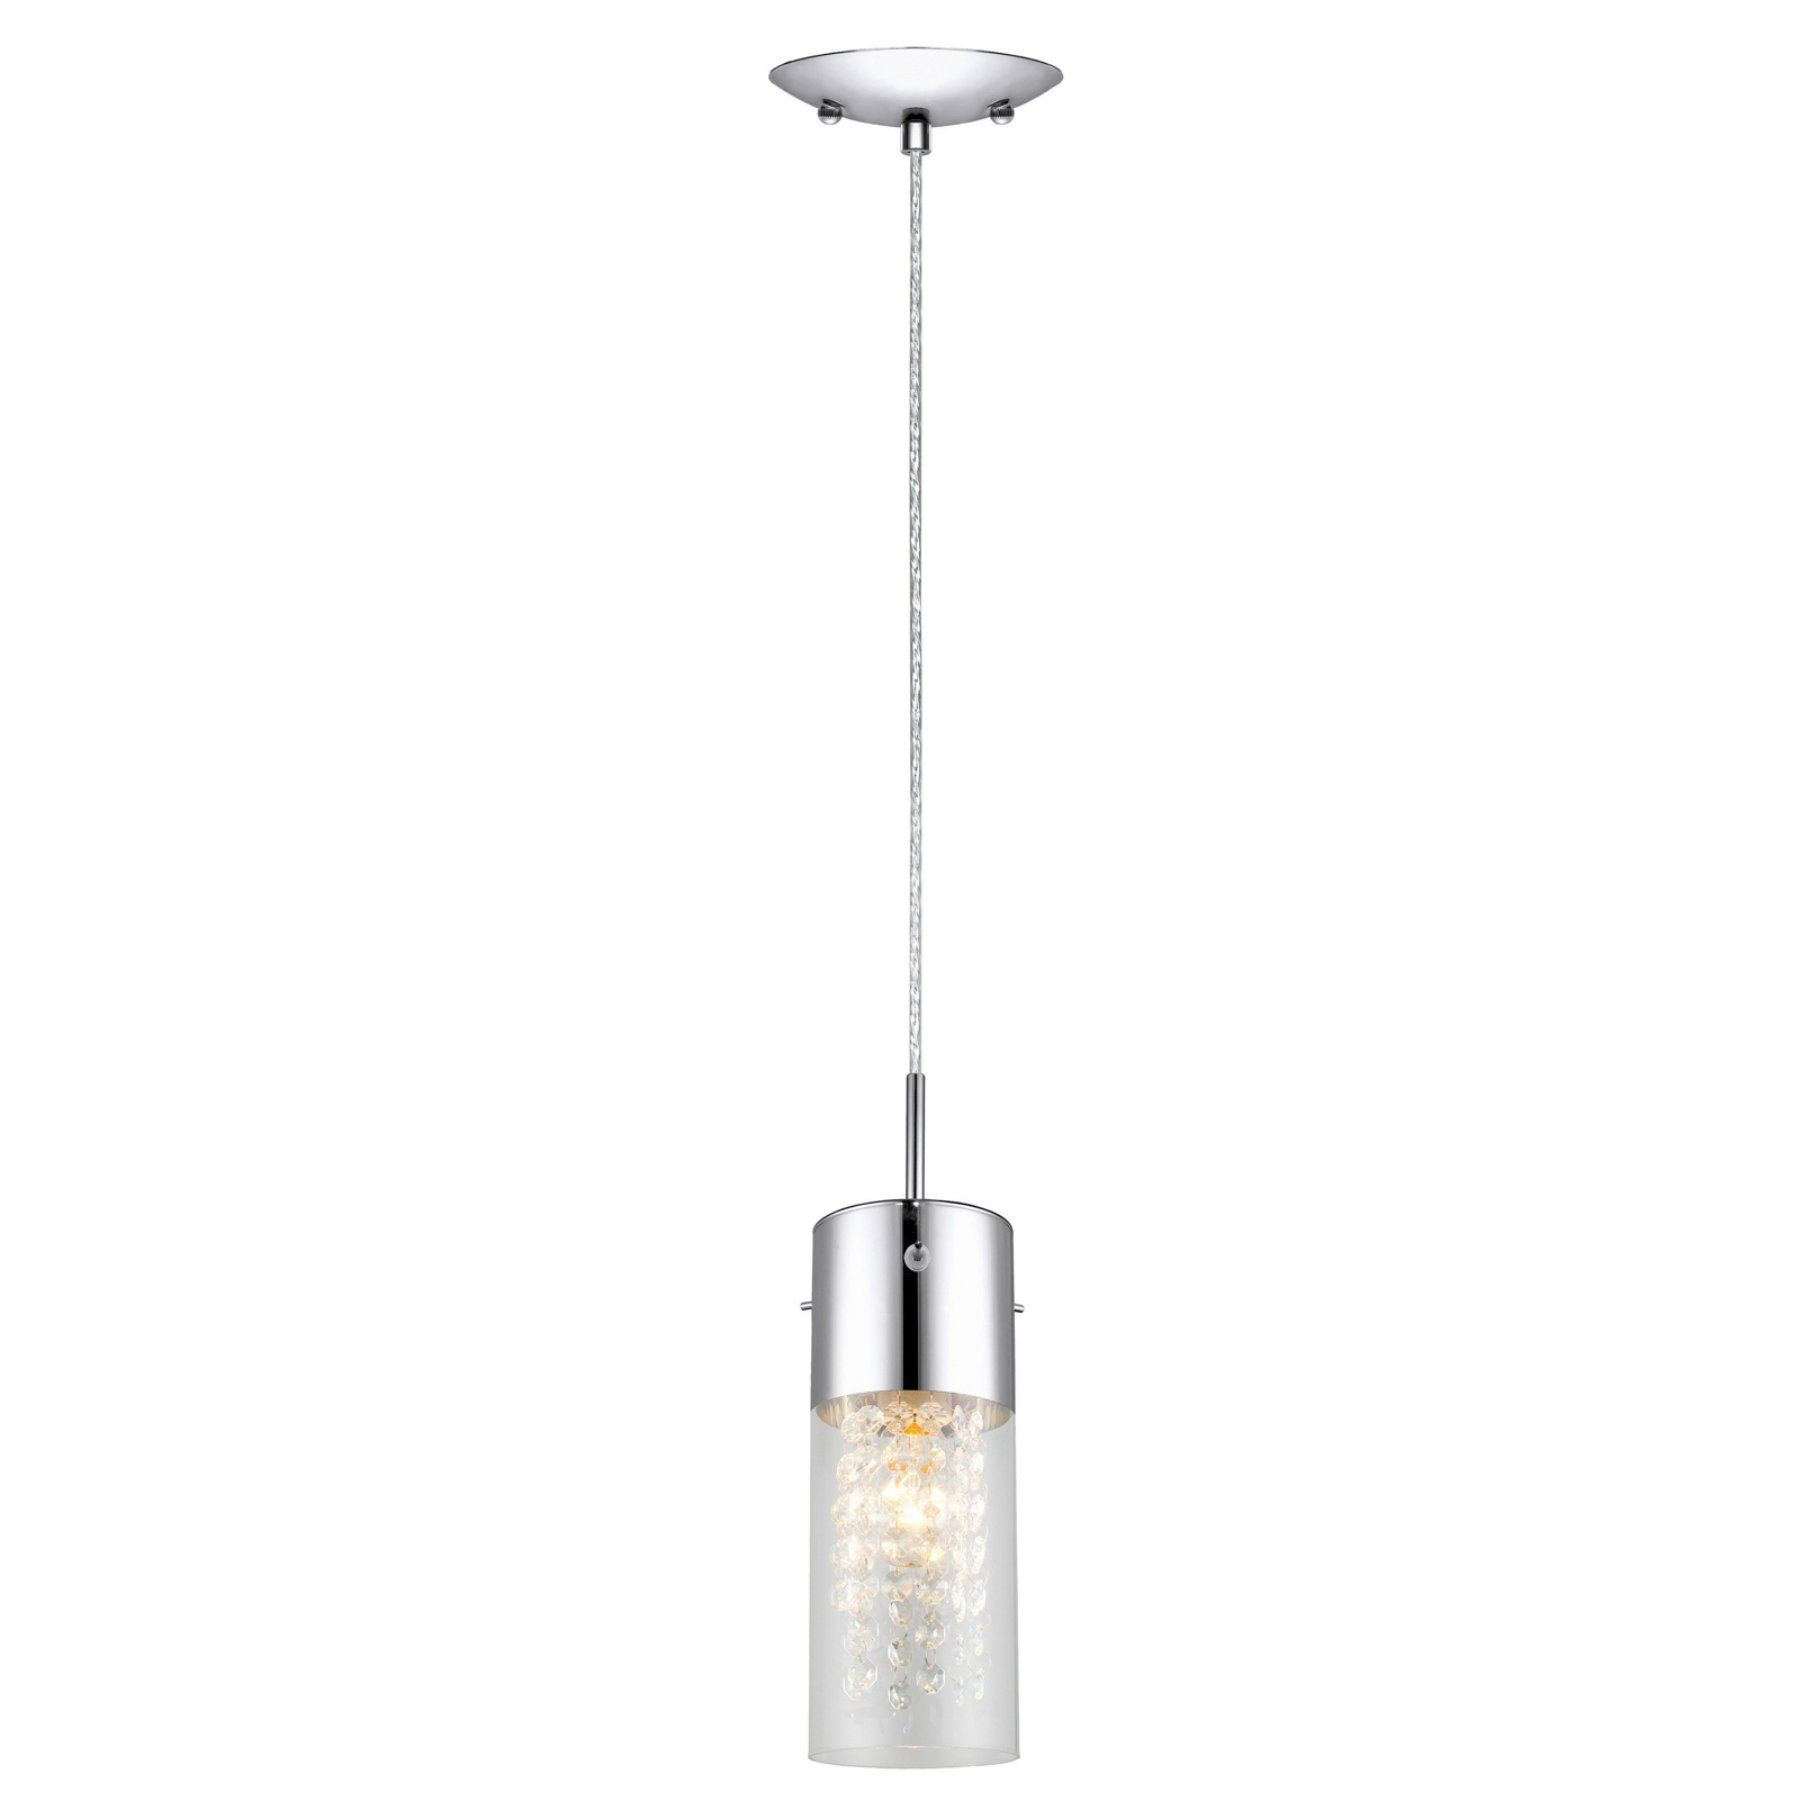 Eglo usa diamond a hanging minipendant light a mini